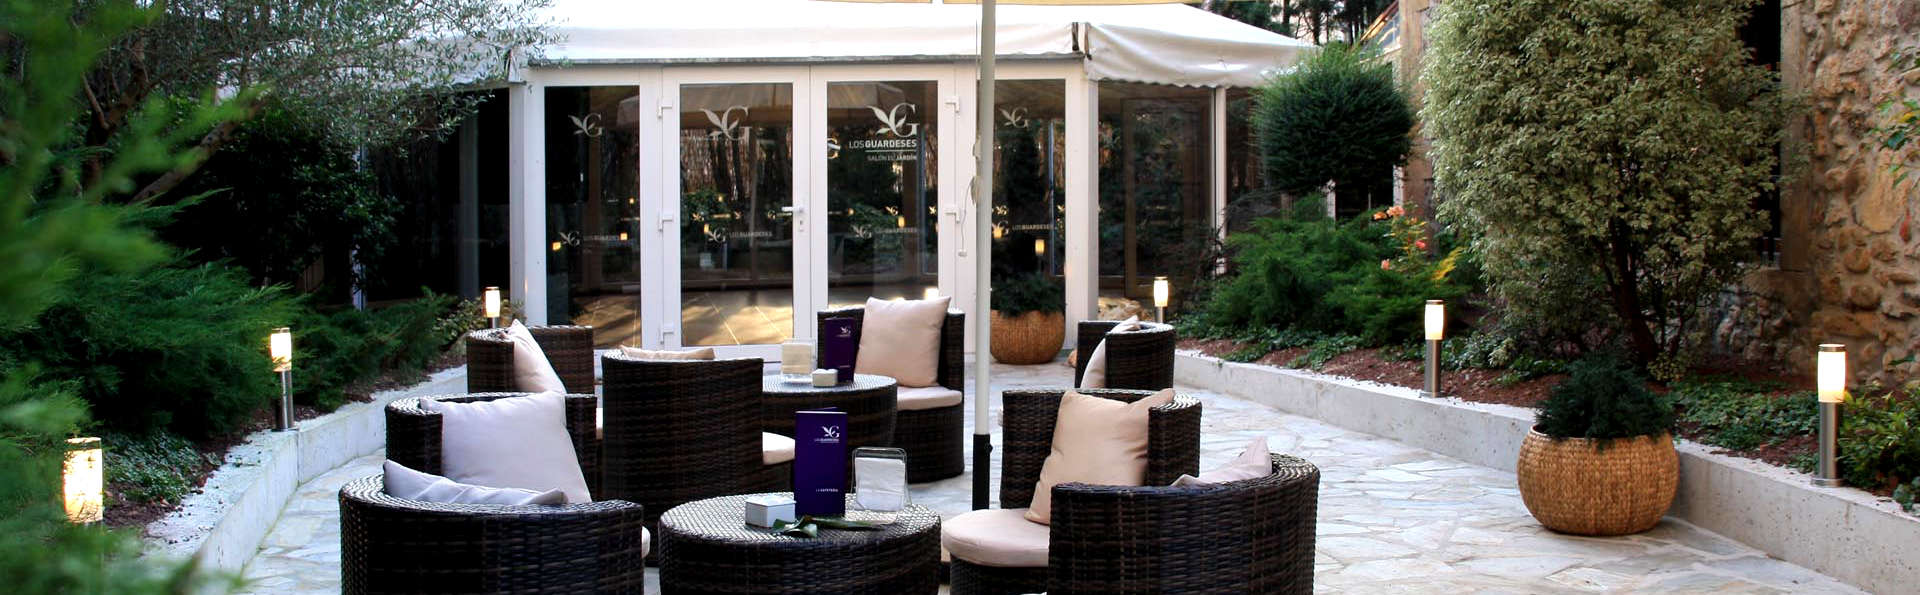 Hotel Los Guardeses - Edit_Terrace3.jpg